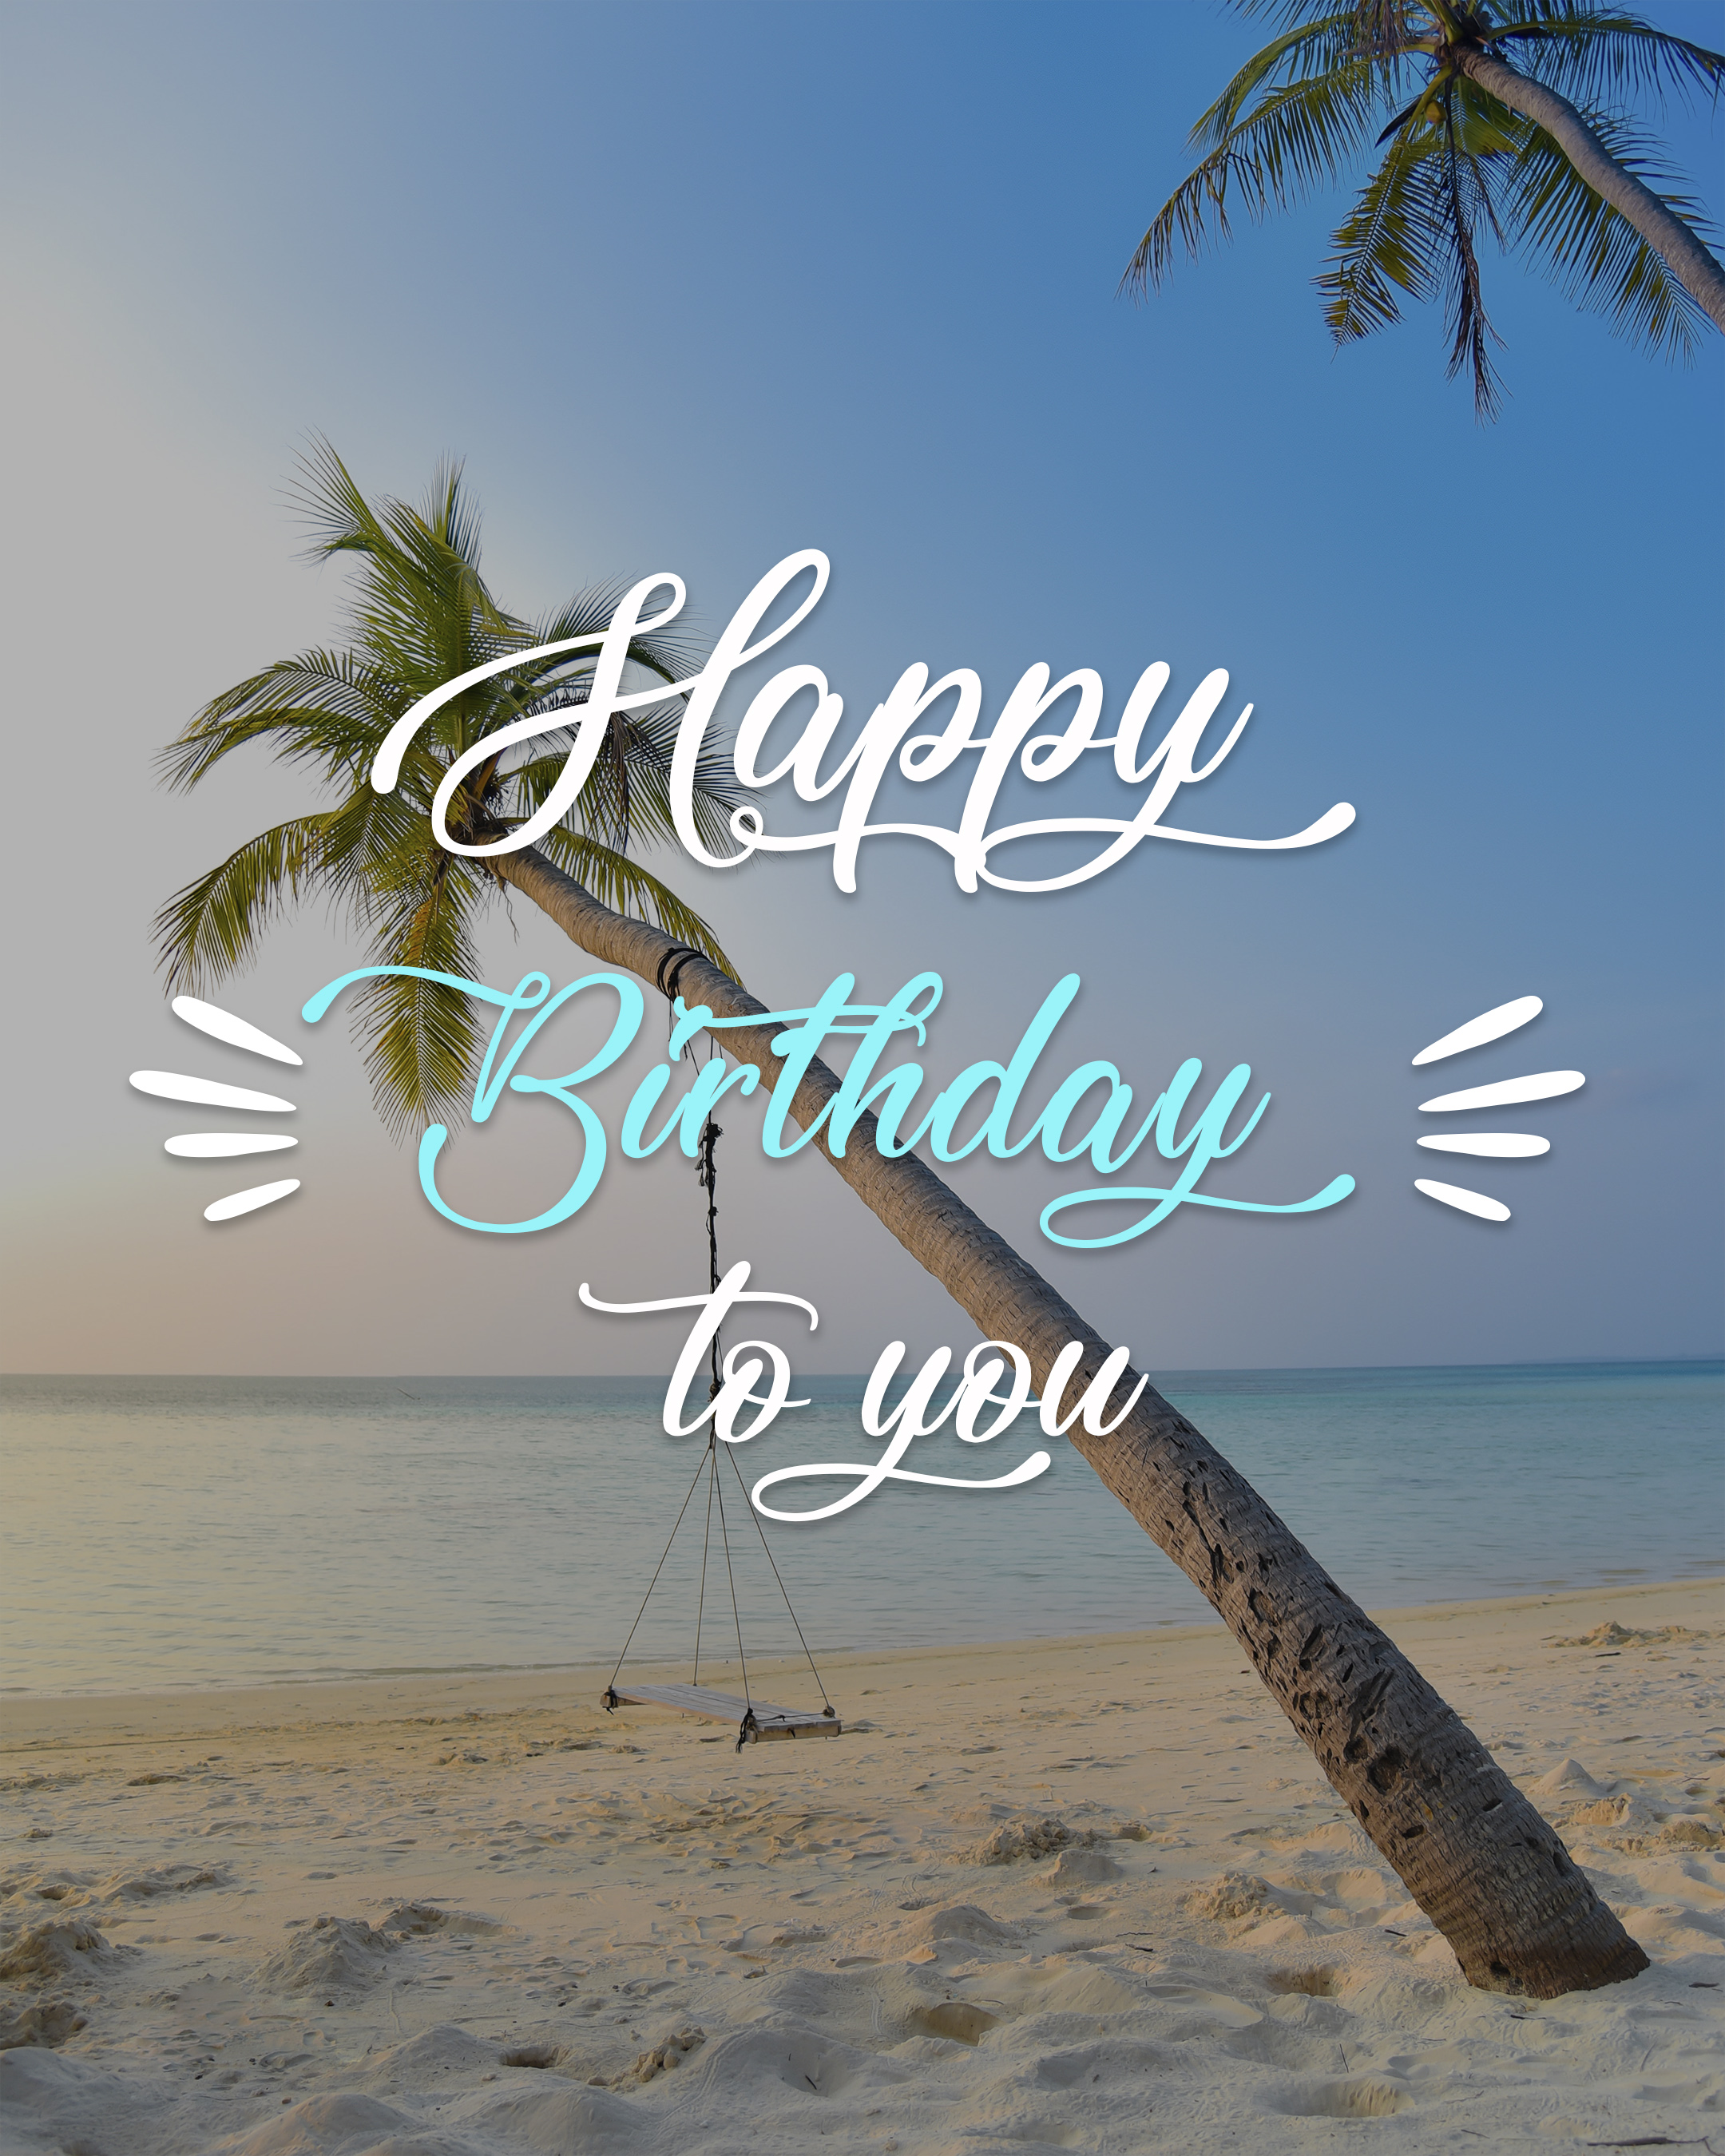 Free Happy Birthday Image With Beach - birthdayimg.com